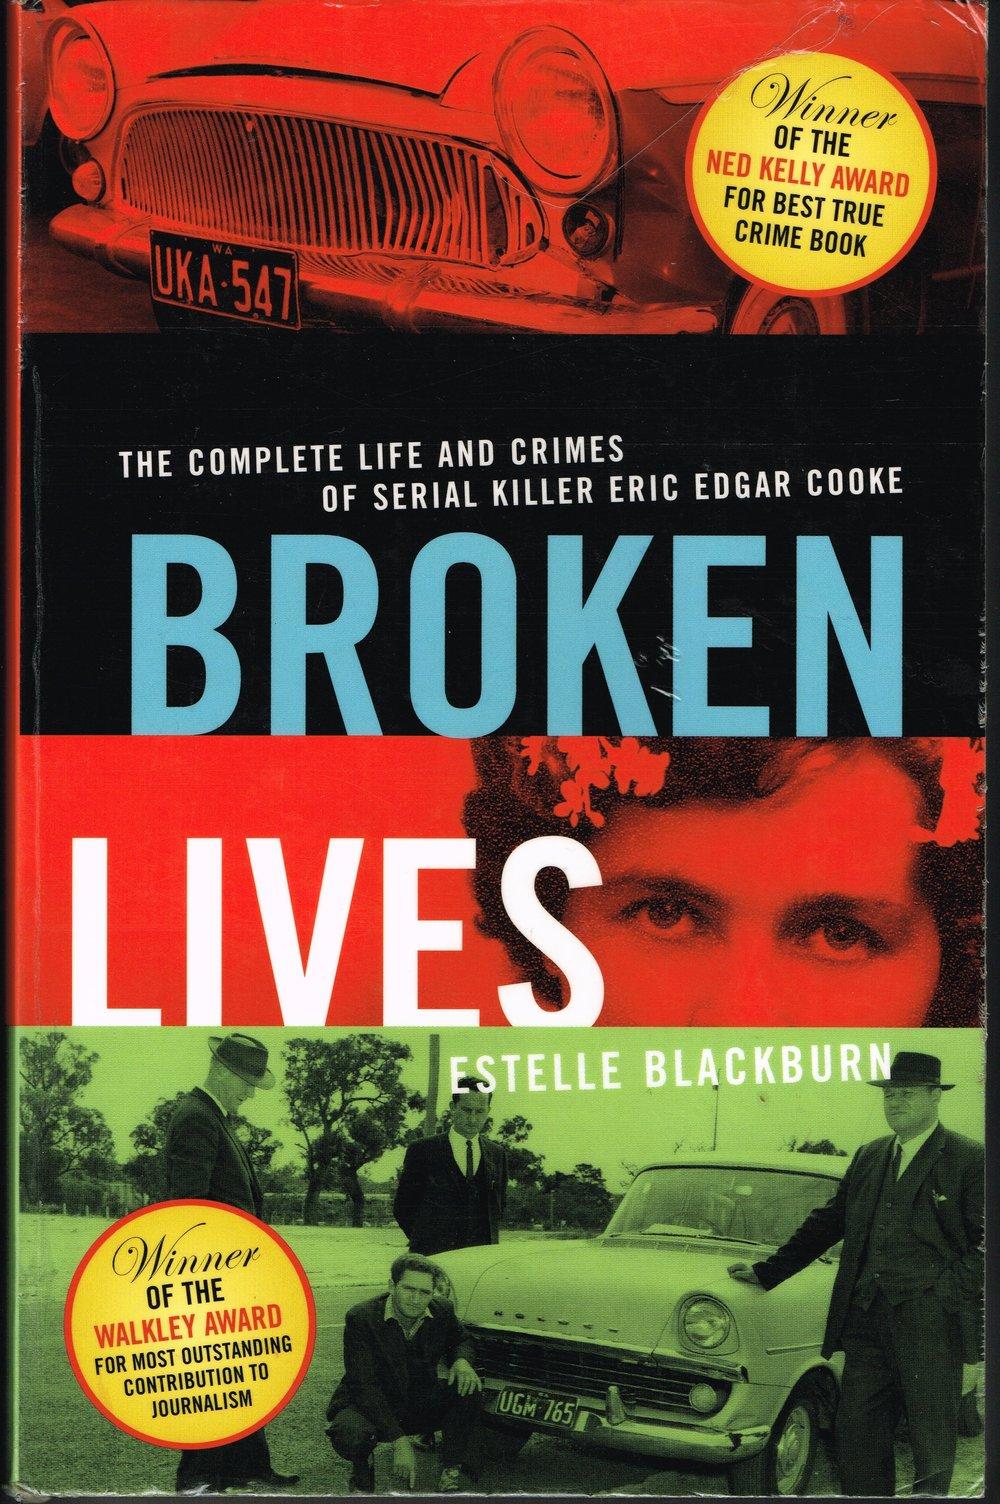 Broken Lives : The complete life and crimes of serial killer Eric Edgar Cooke Estelle Blackburn